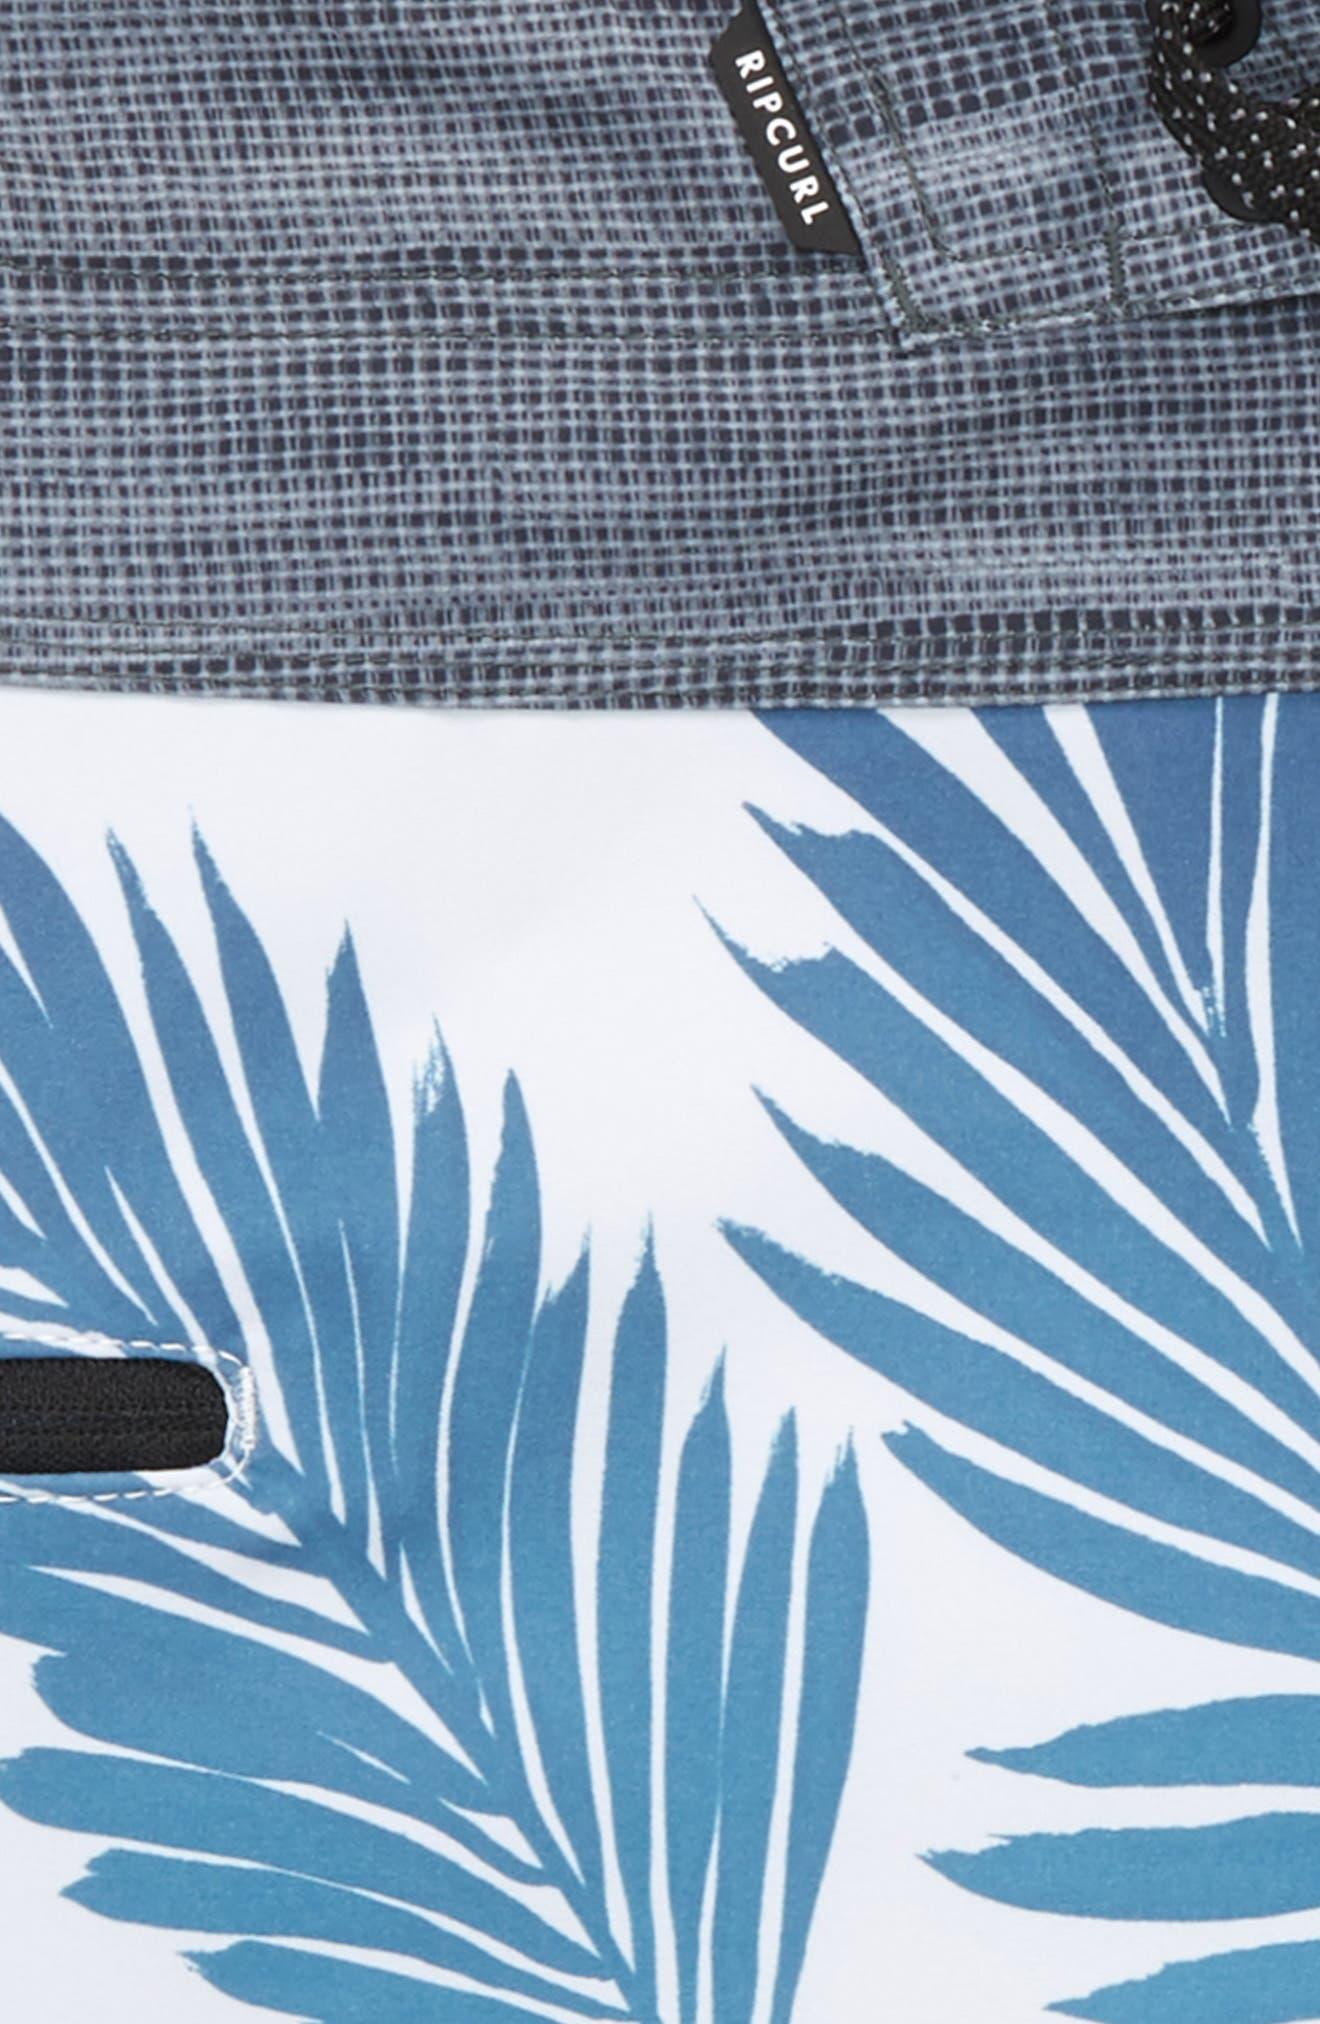 Mirage Mason Rockies Board Shorts,                             Alternate thumbnail 2, color,                             Light Blue